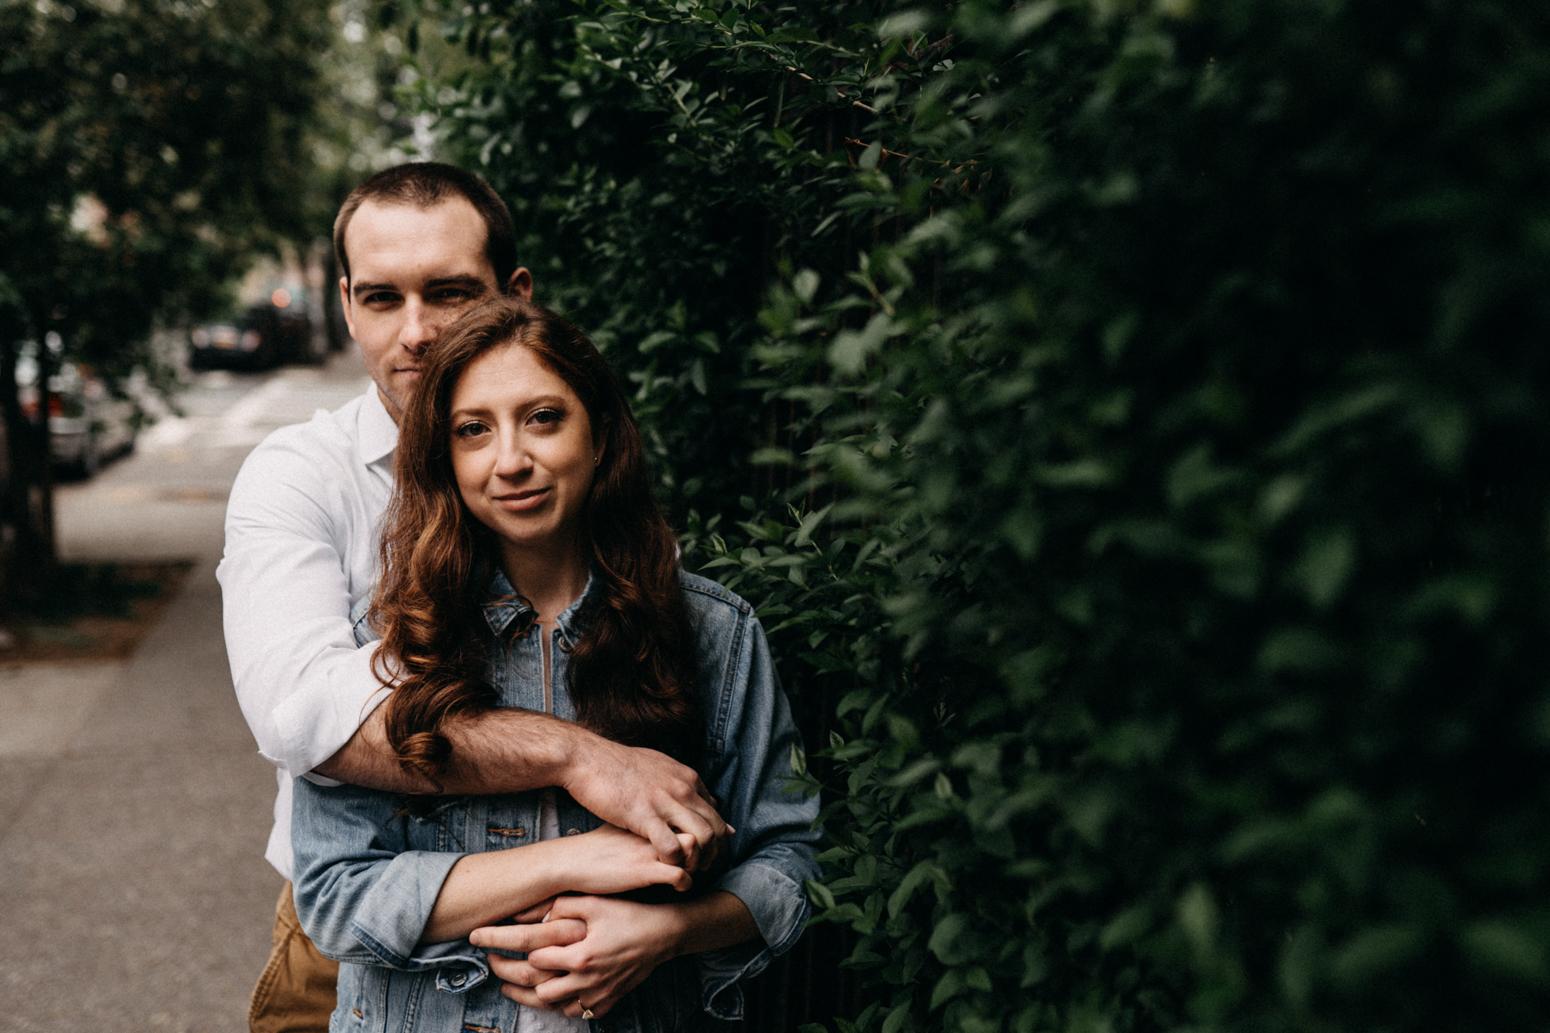 New York City Wedding Photographer (53 of 59).JPG